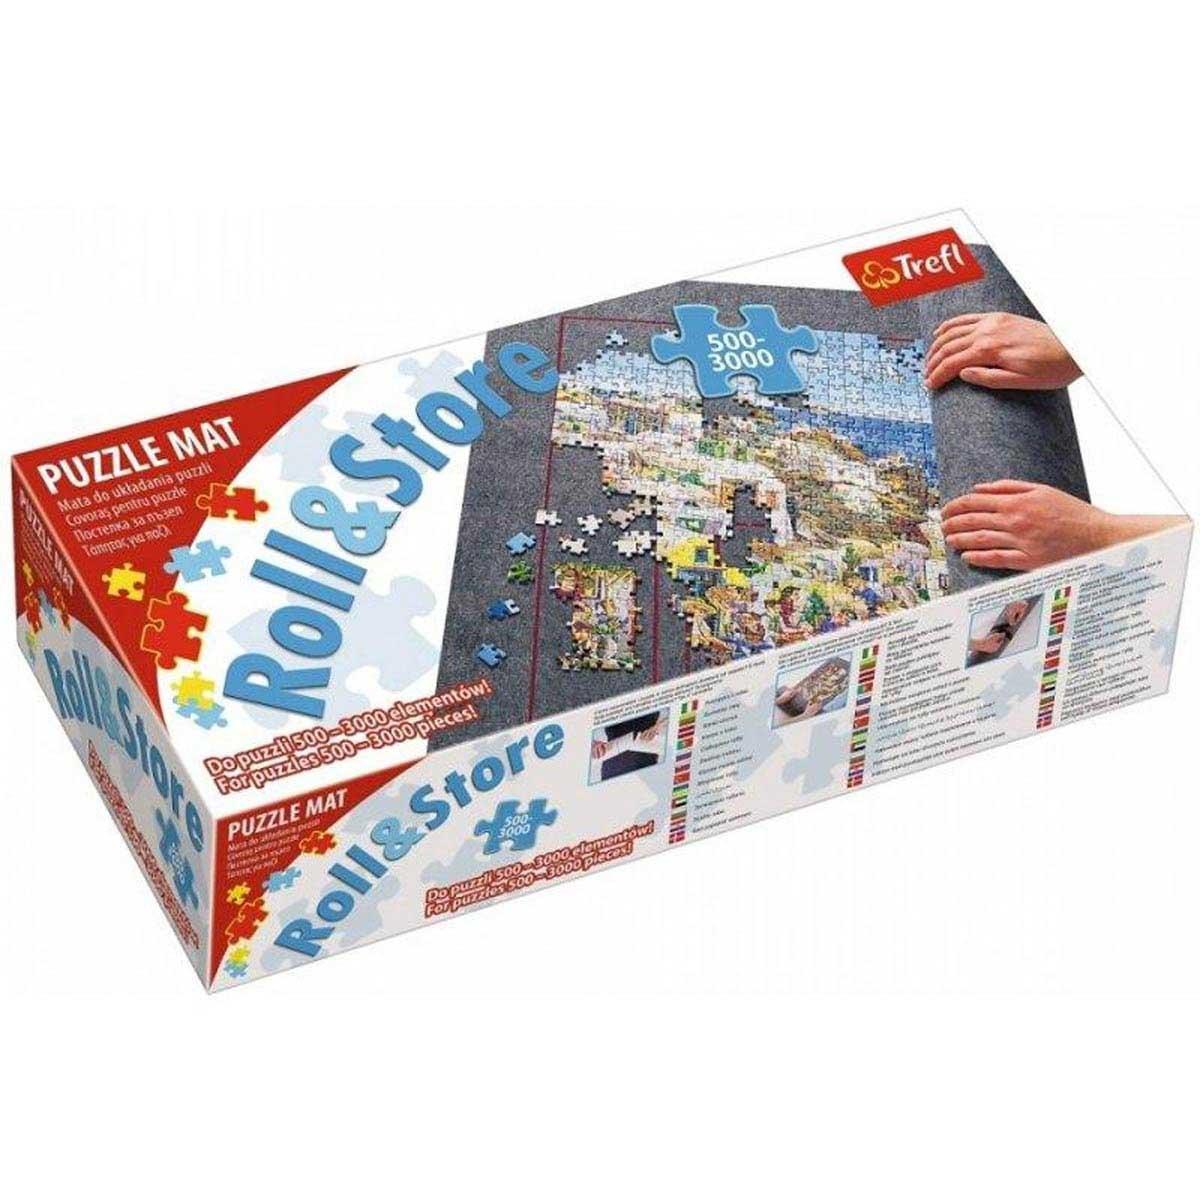 PODLOGA ZA PUZZLE 500-1500